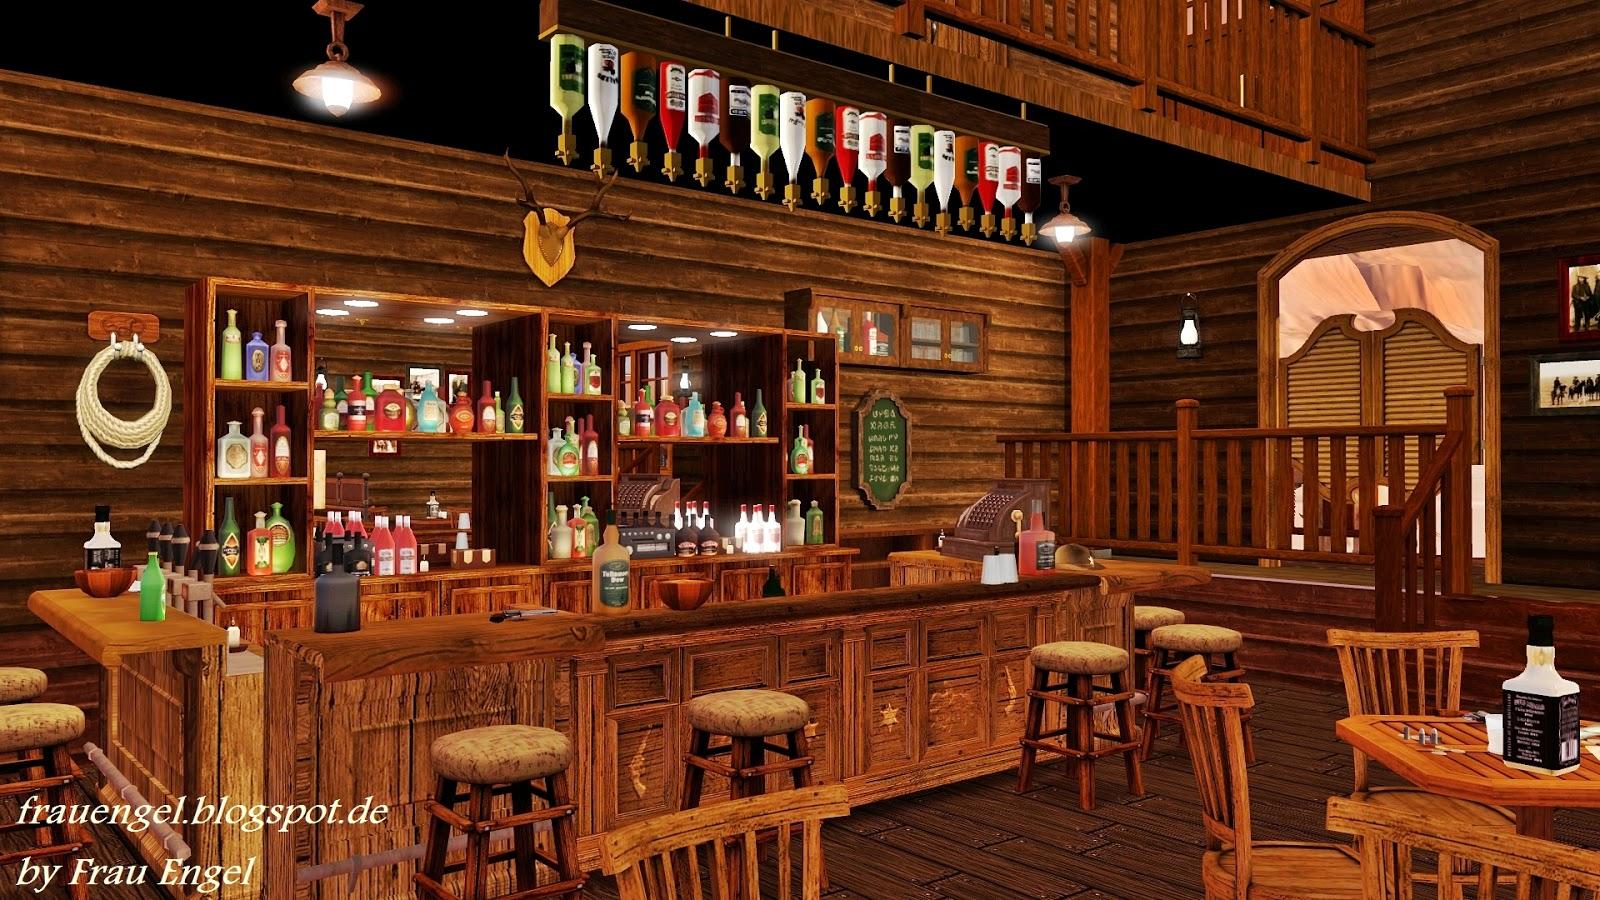 My Sims 3 Blog Saloon In The Wild West By Frau Engel